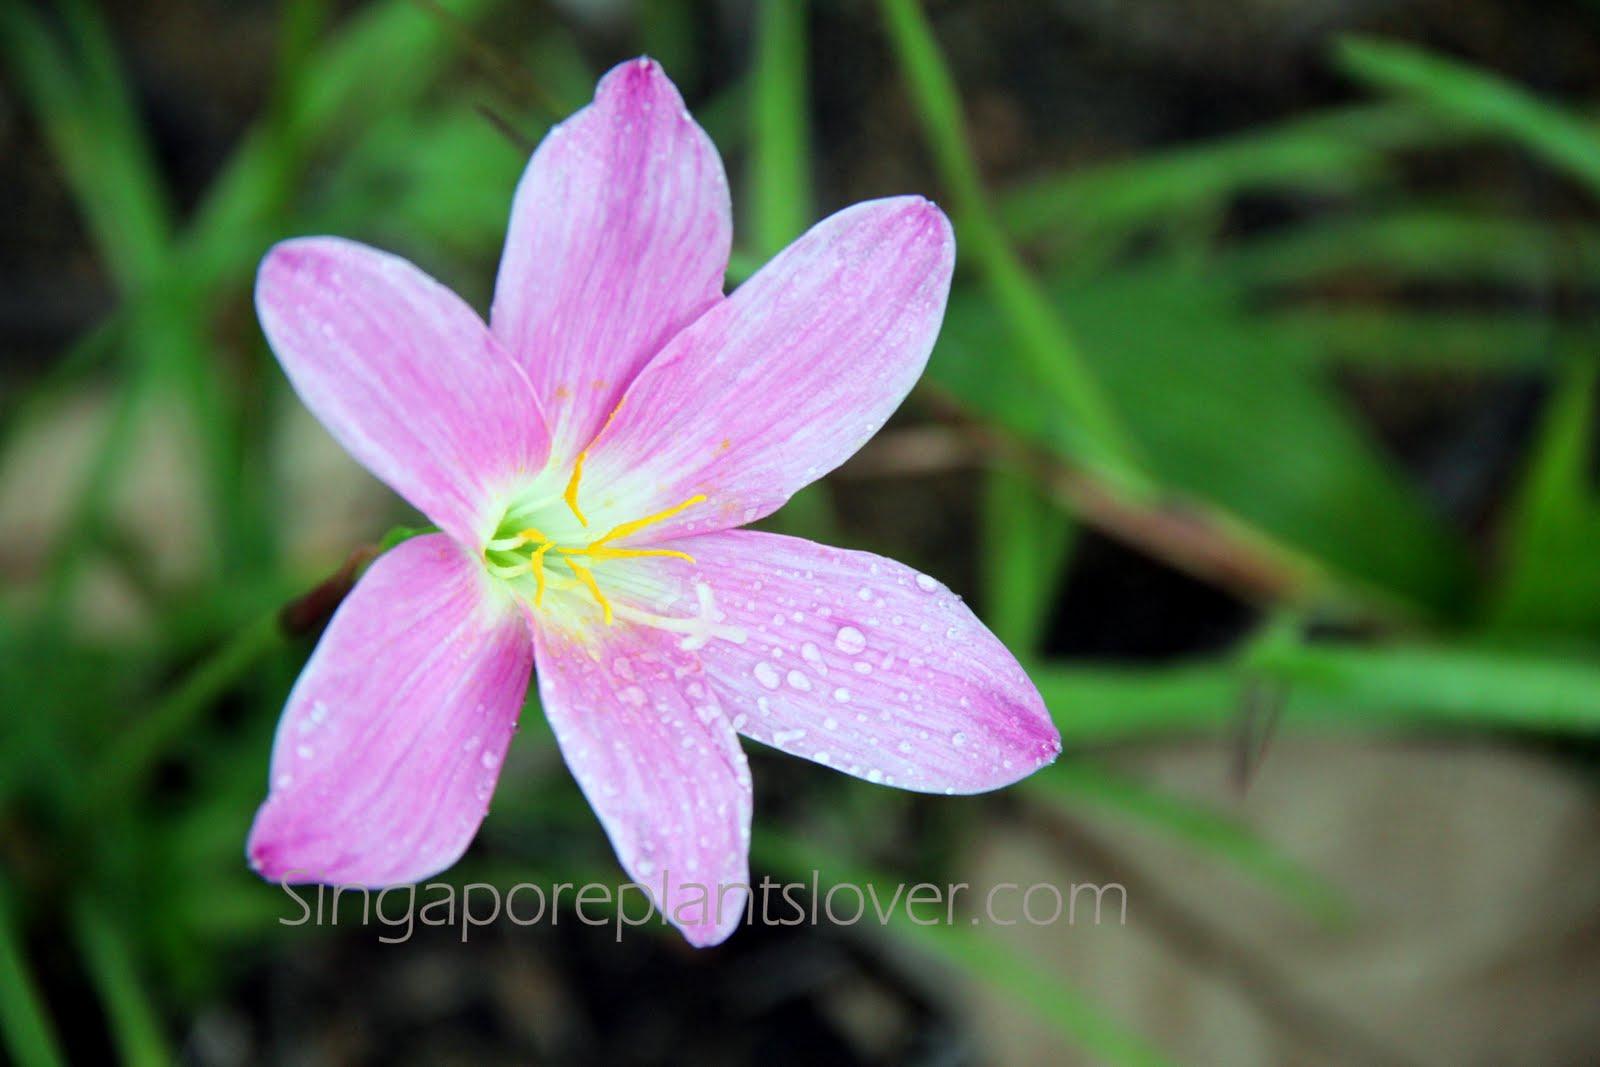 Singapore Plants Lover: January 2012